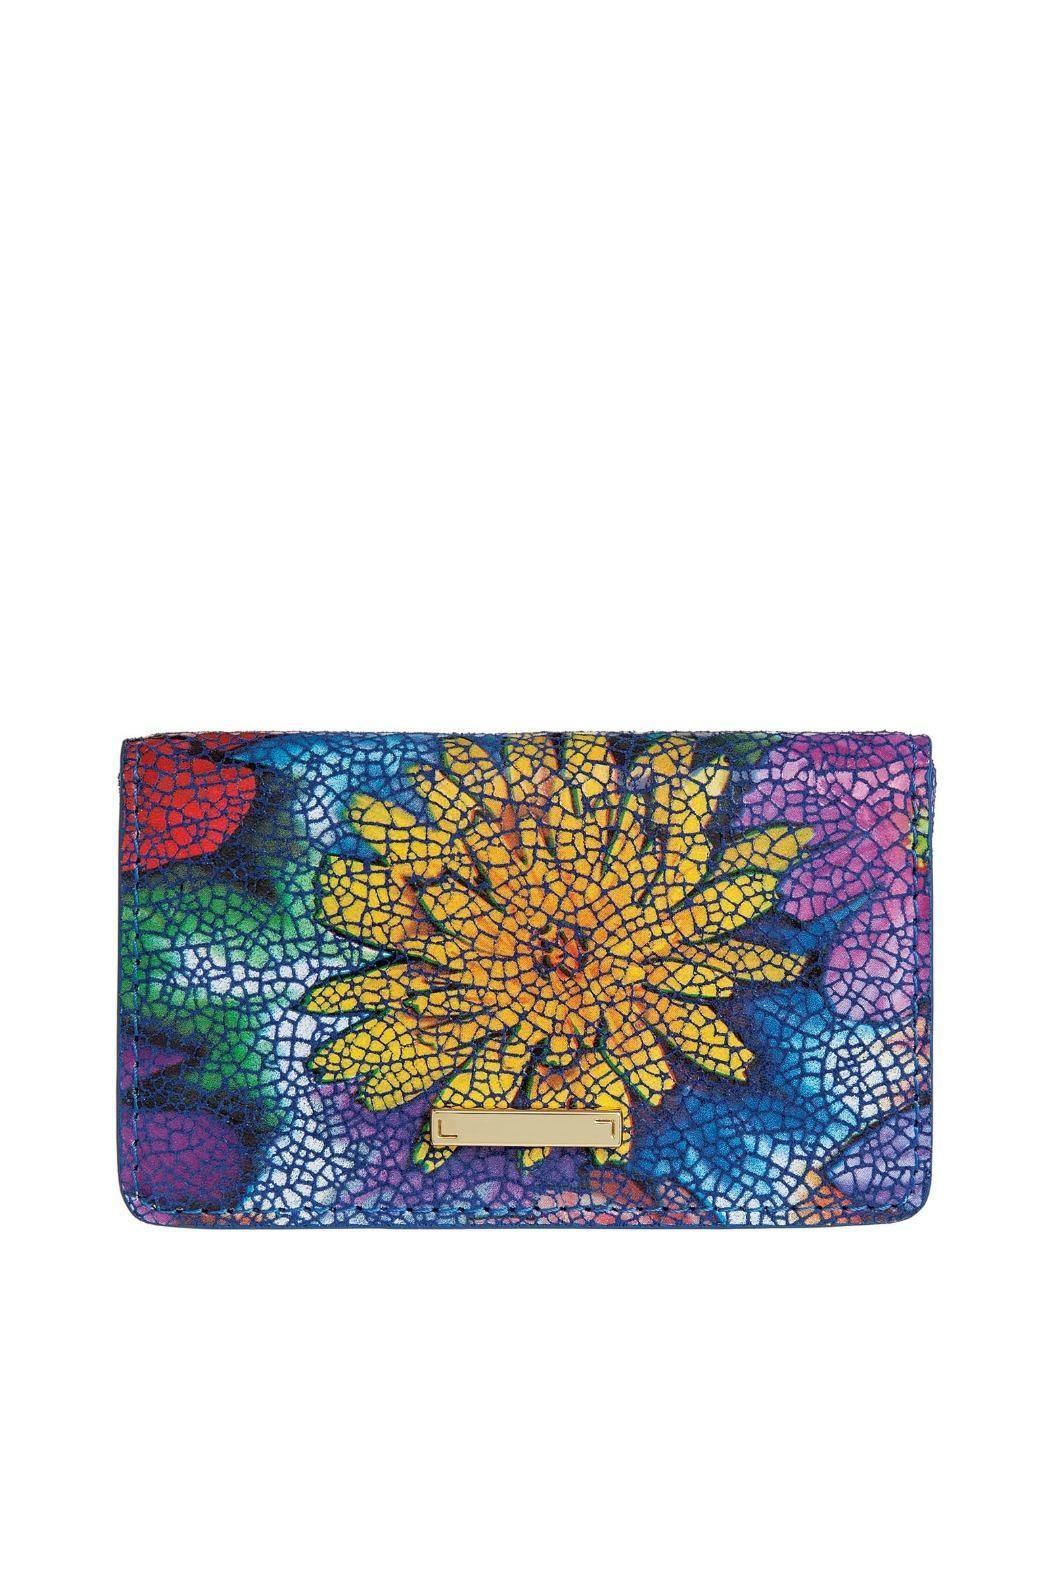 Lodis Mini Card Case | Unique business cards, Card case and ...